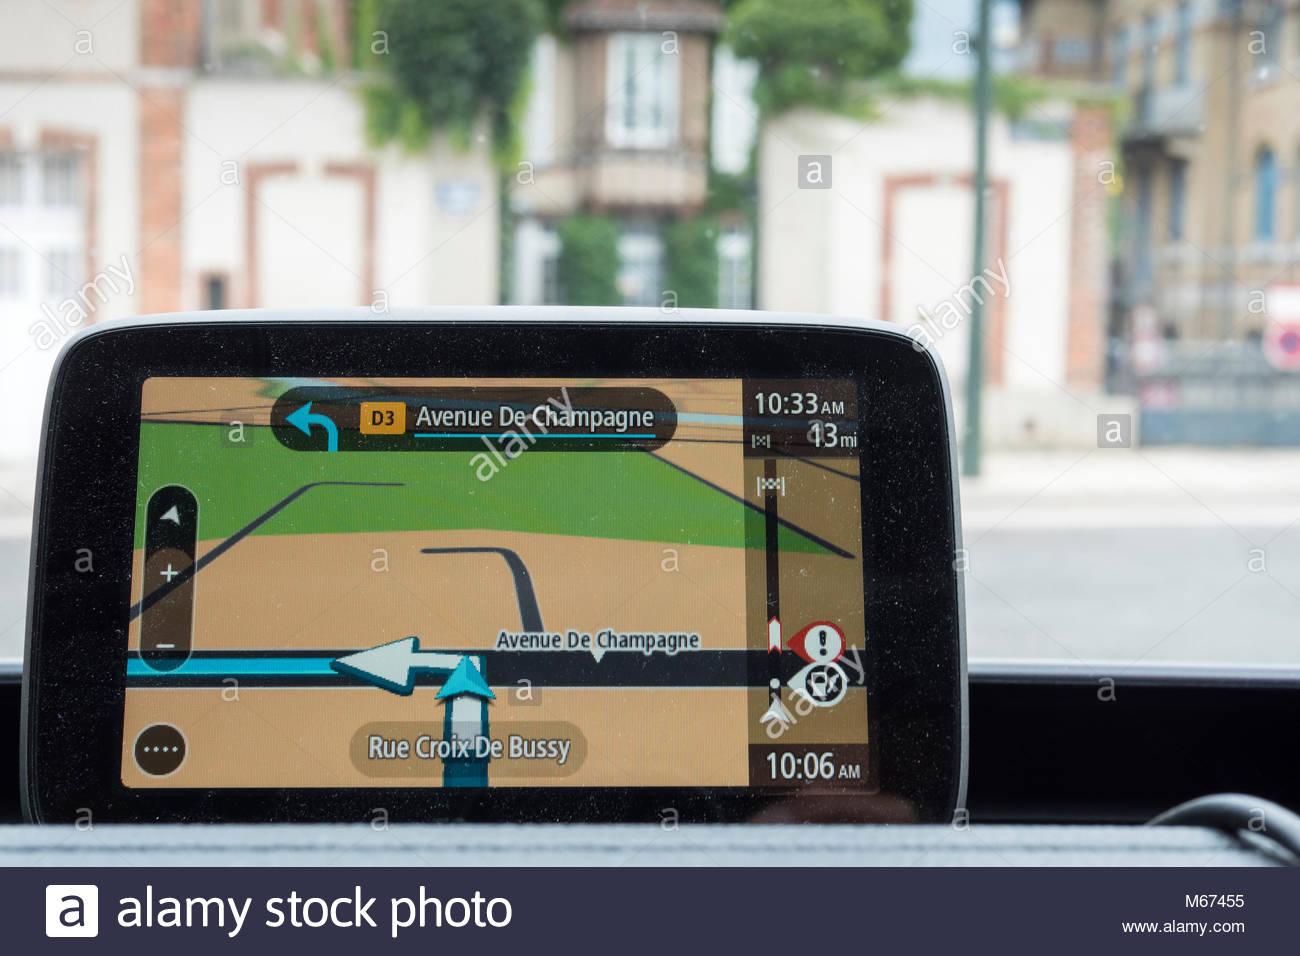 Satnav in car at Avenue de Champagne Epernay Marne Grand Est France - Stock Image